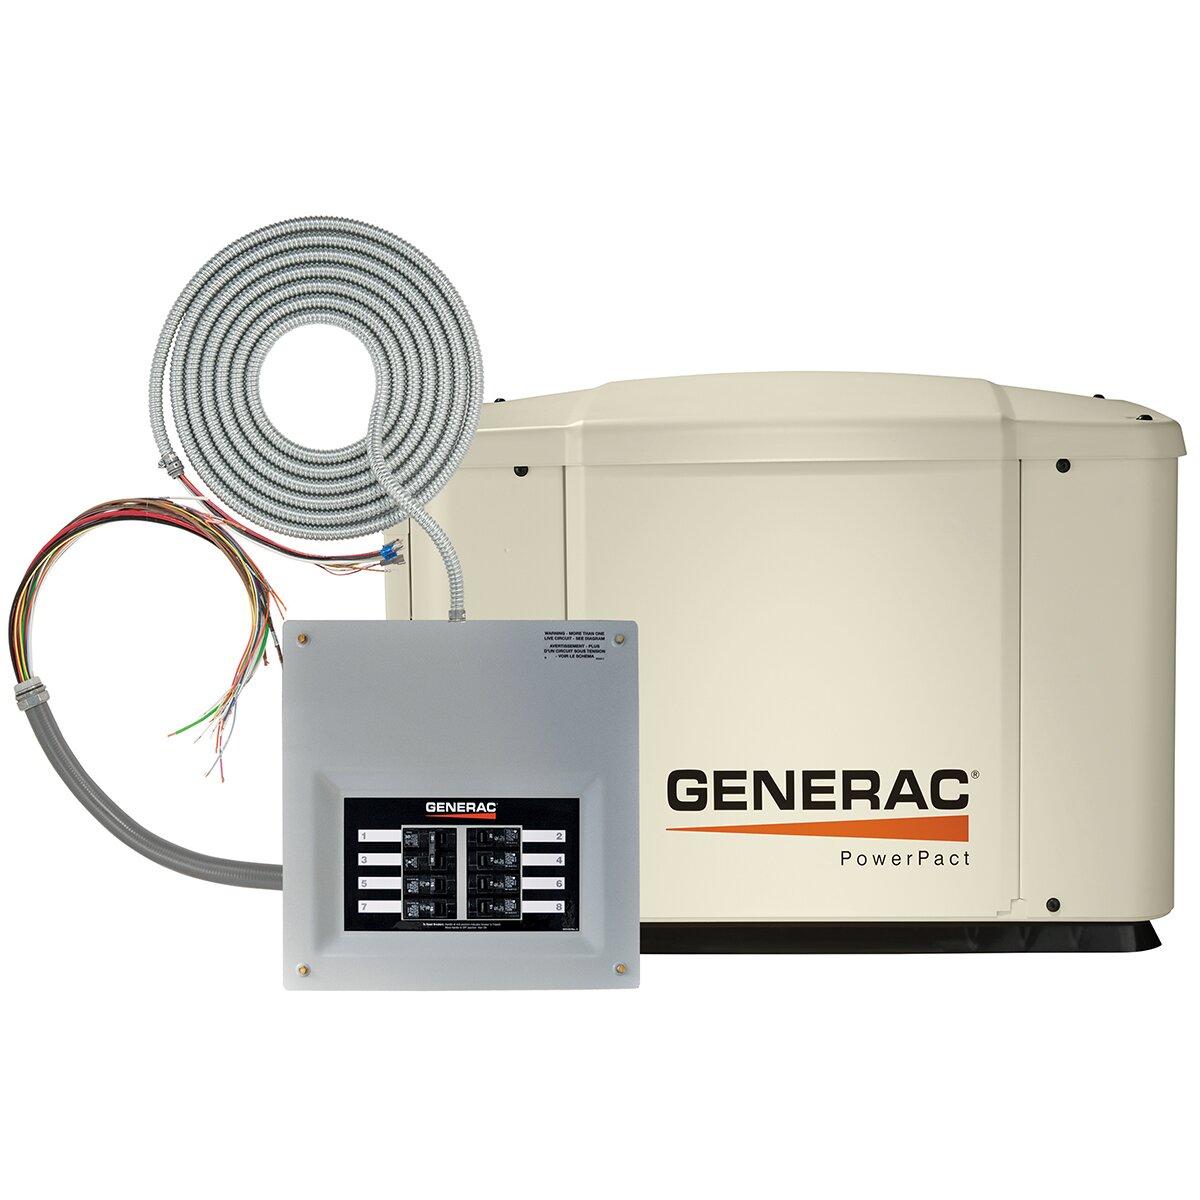 Home Improvement Generators Standby Generators Generac SKU: GDN1574